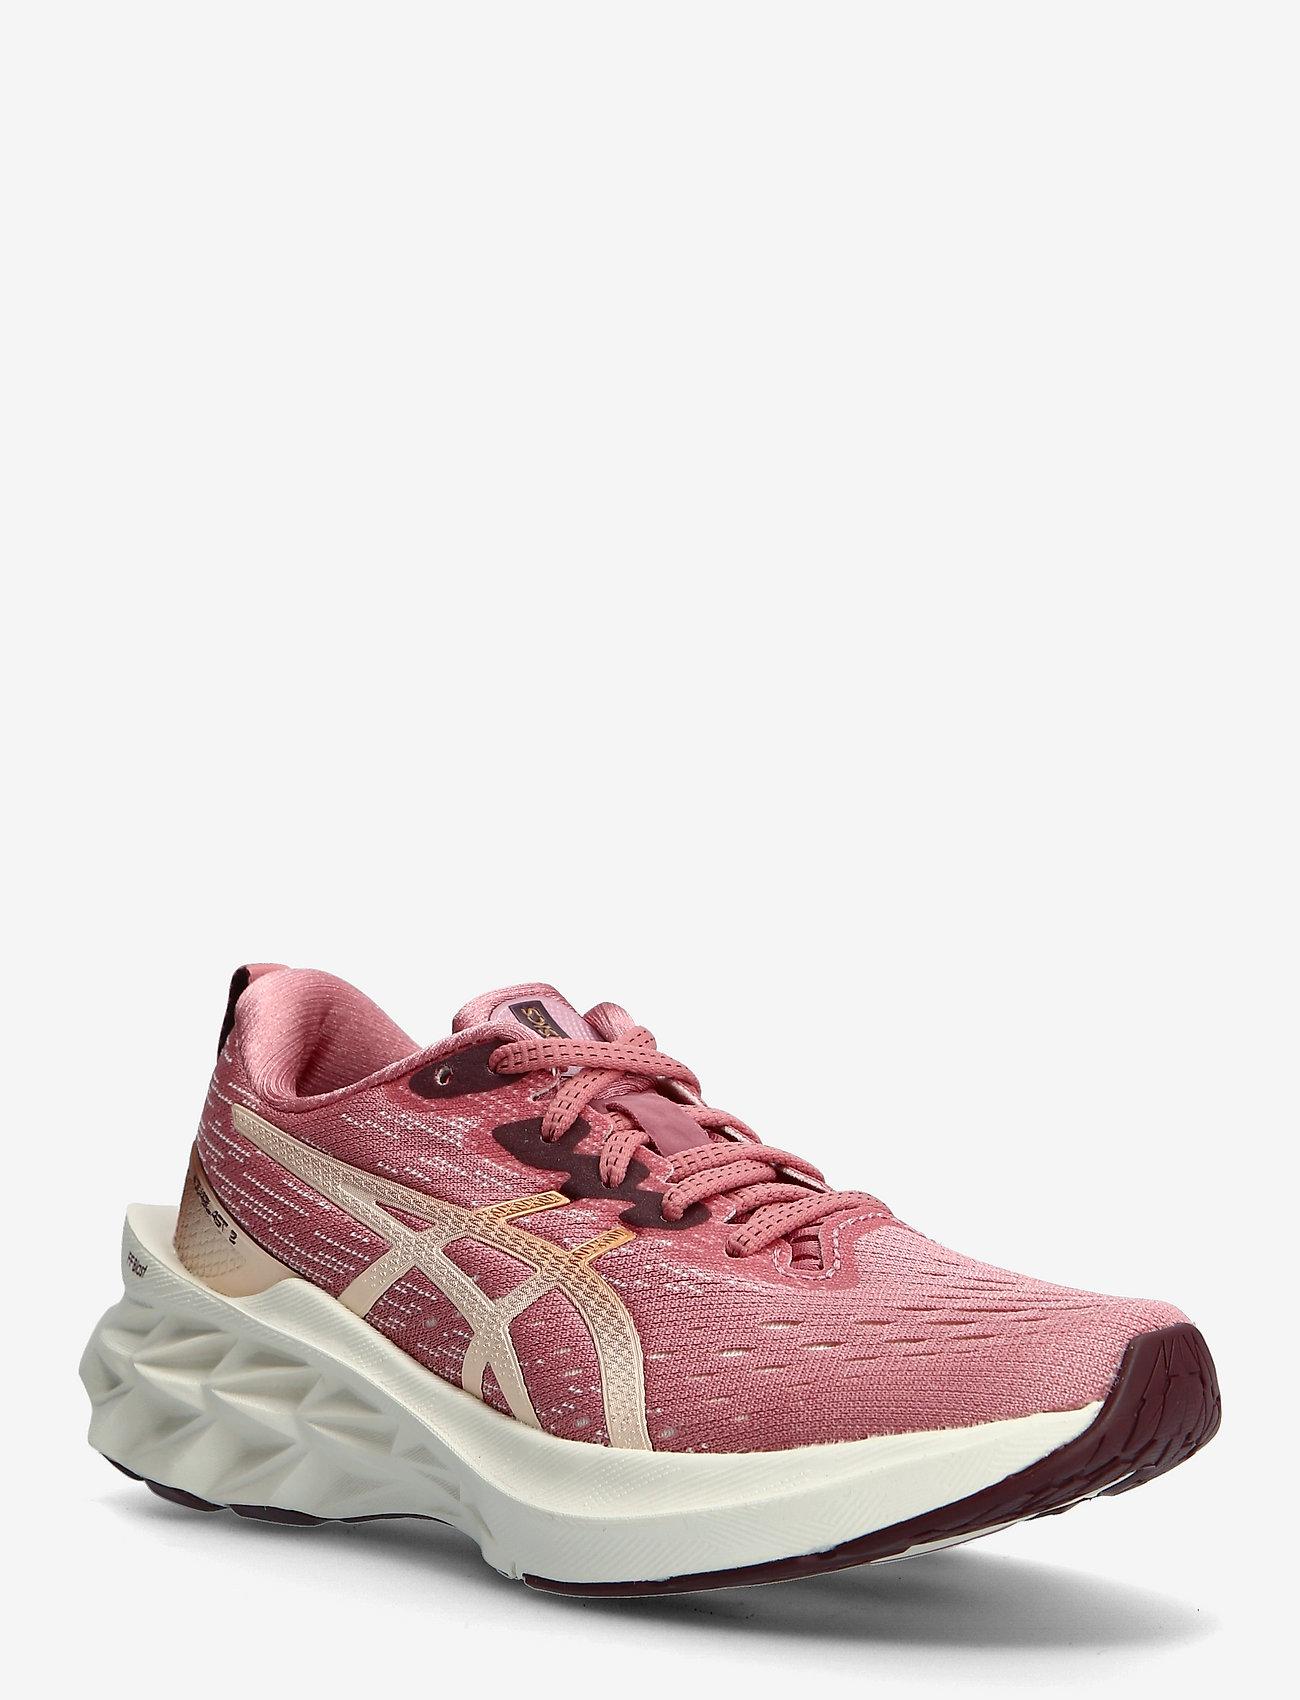 Asics - NOVABLAST 2 - running shoes - smokey rose/pure bronze - 0